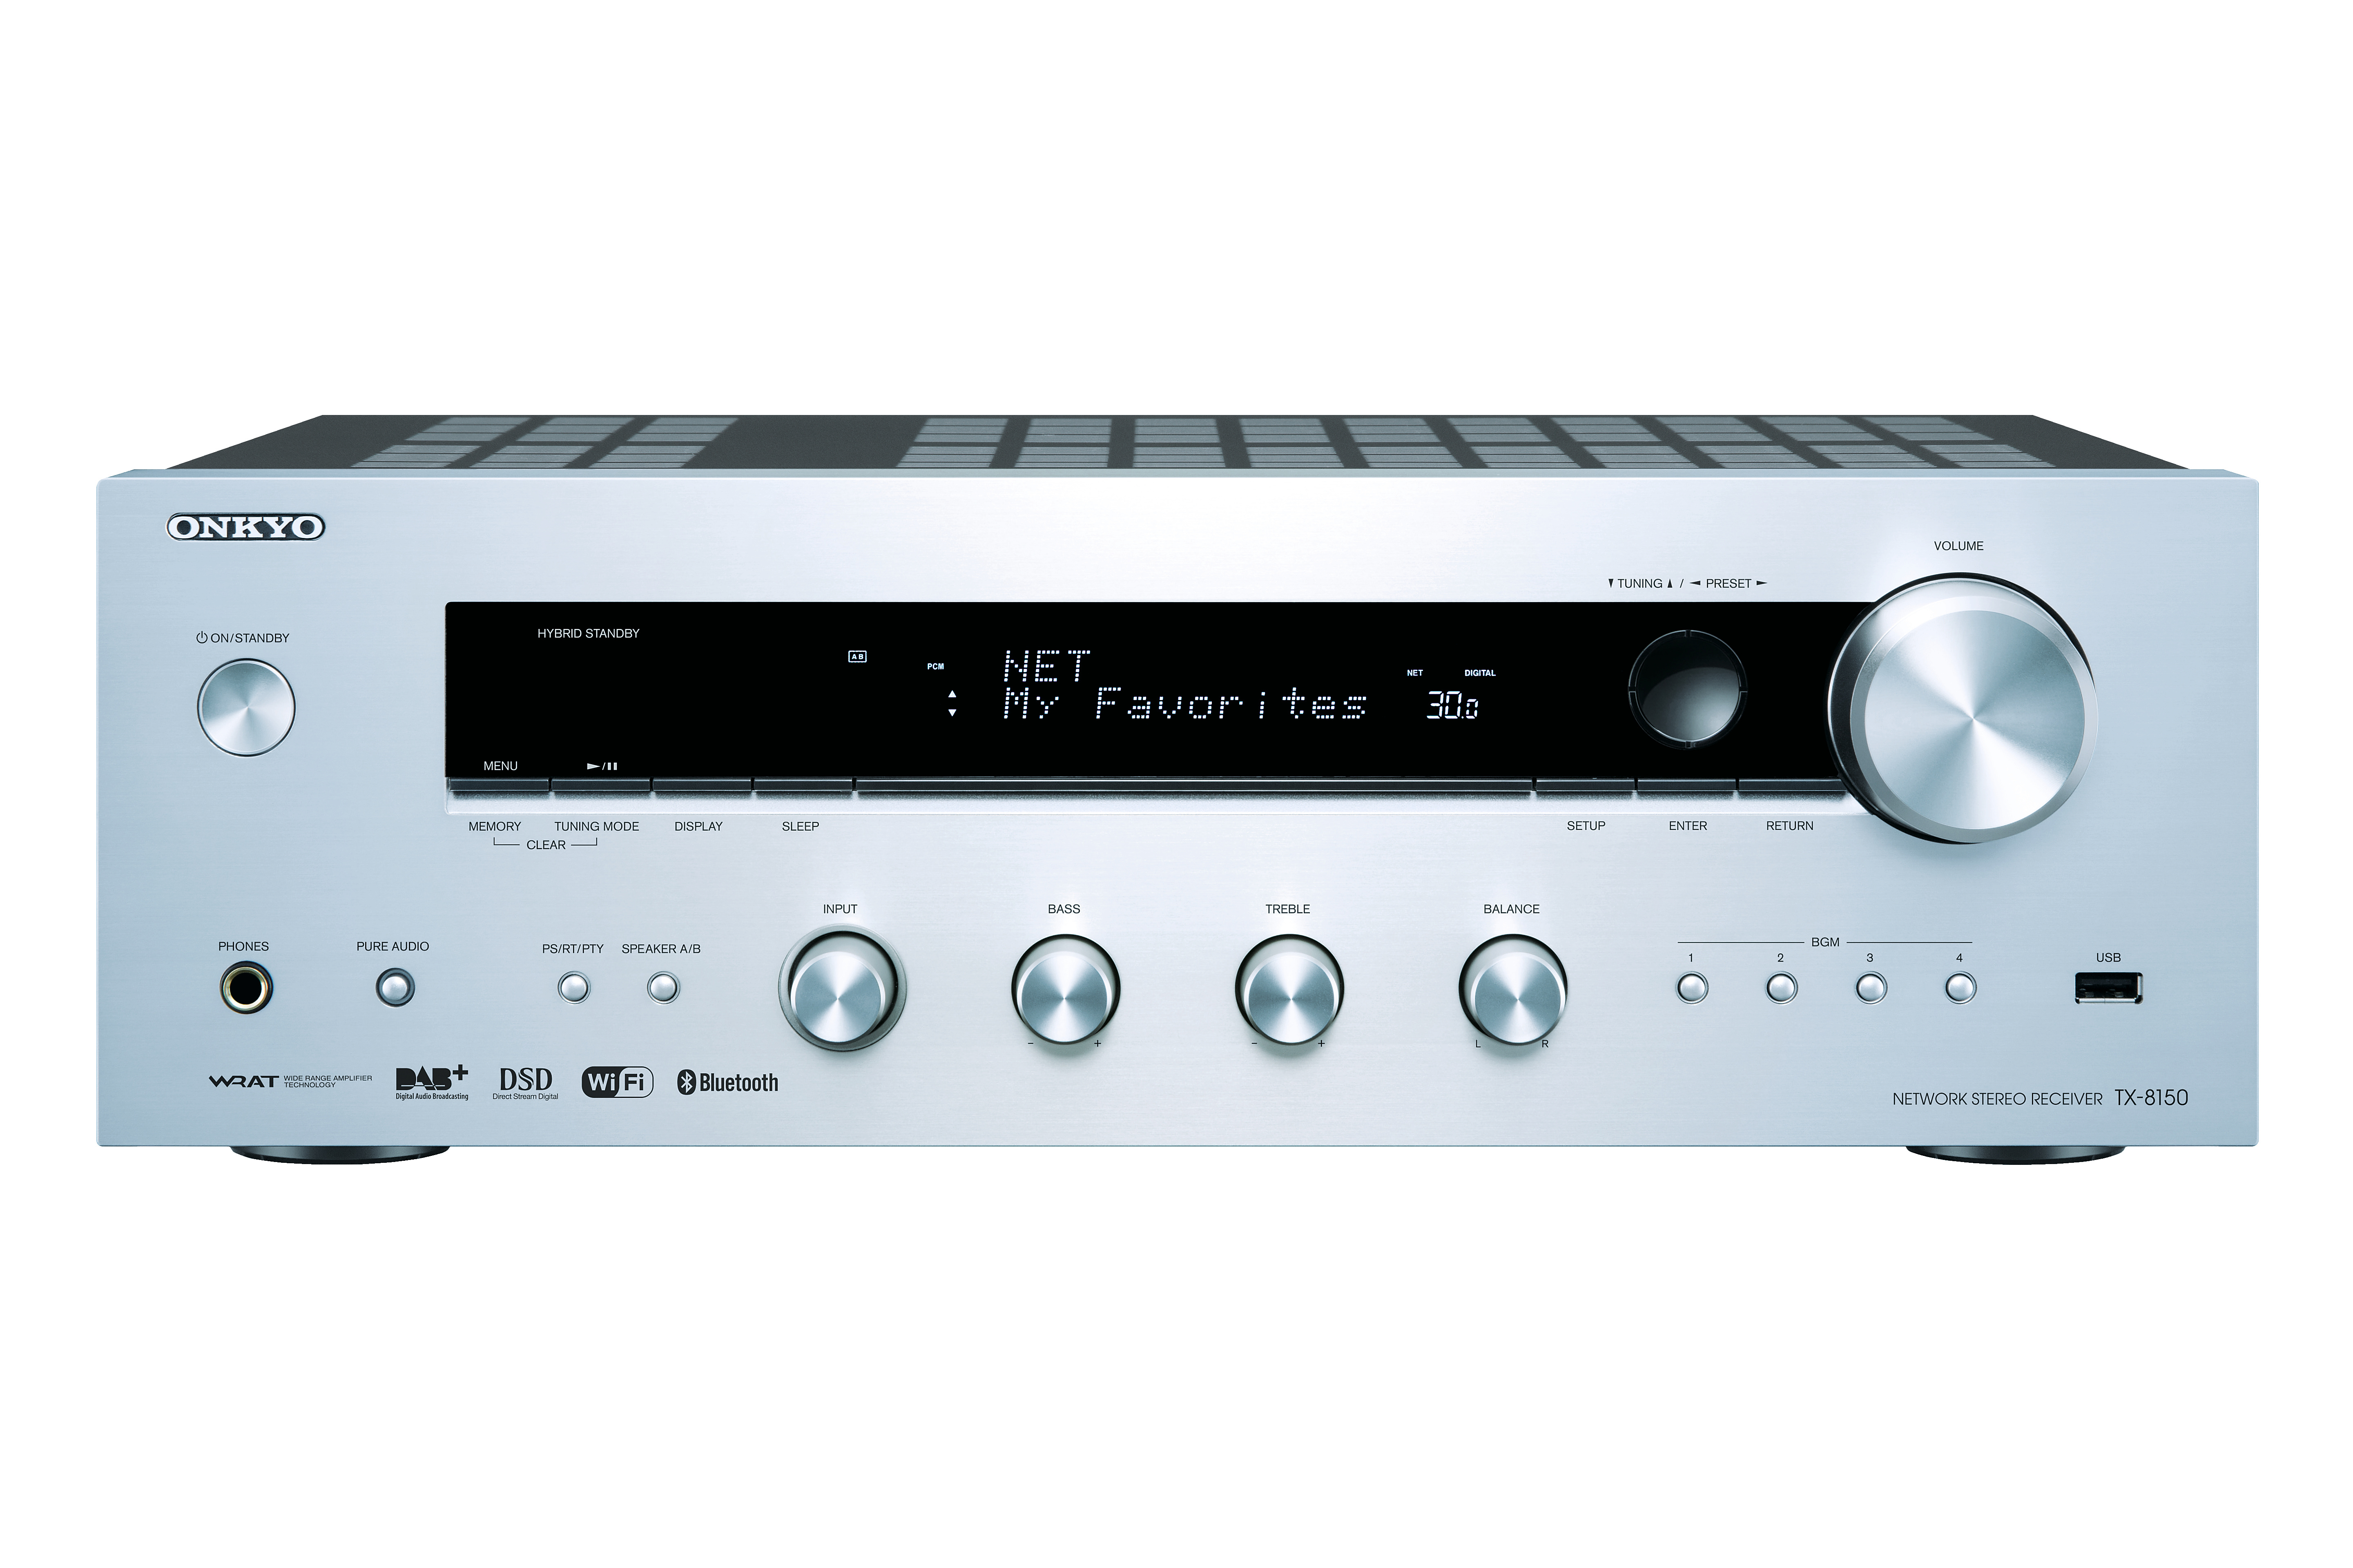 Onkyo Vs Yamaha Stereo Receiver